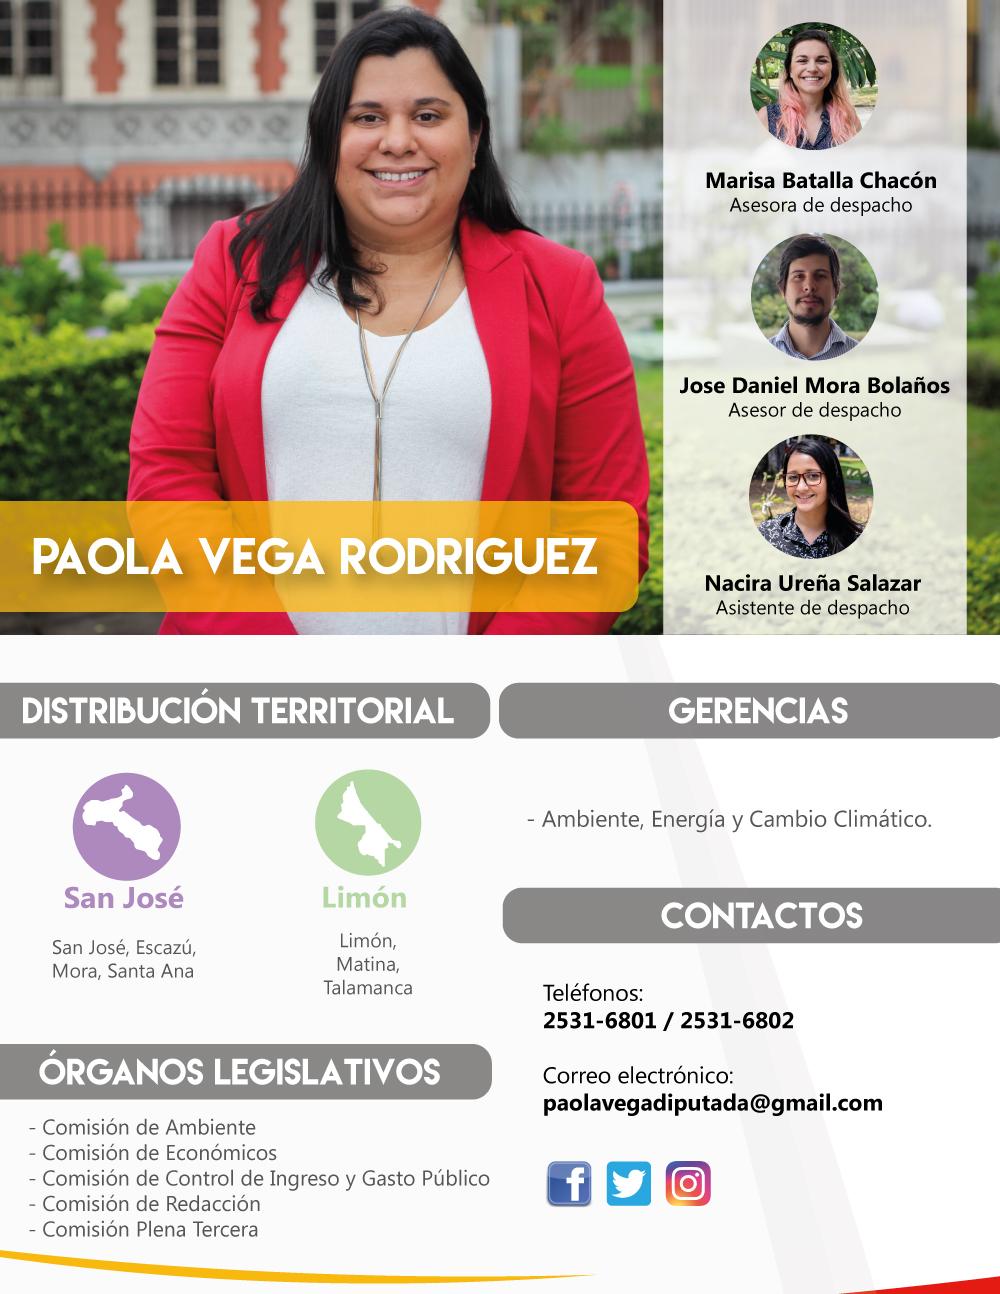 Despacho-Paola-Vega